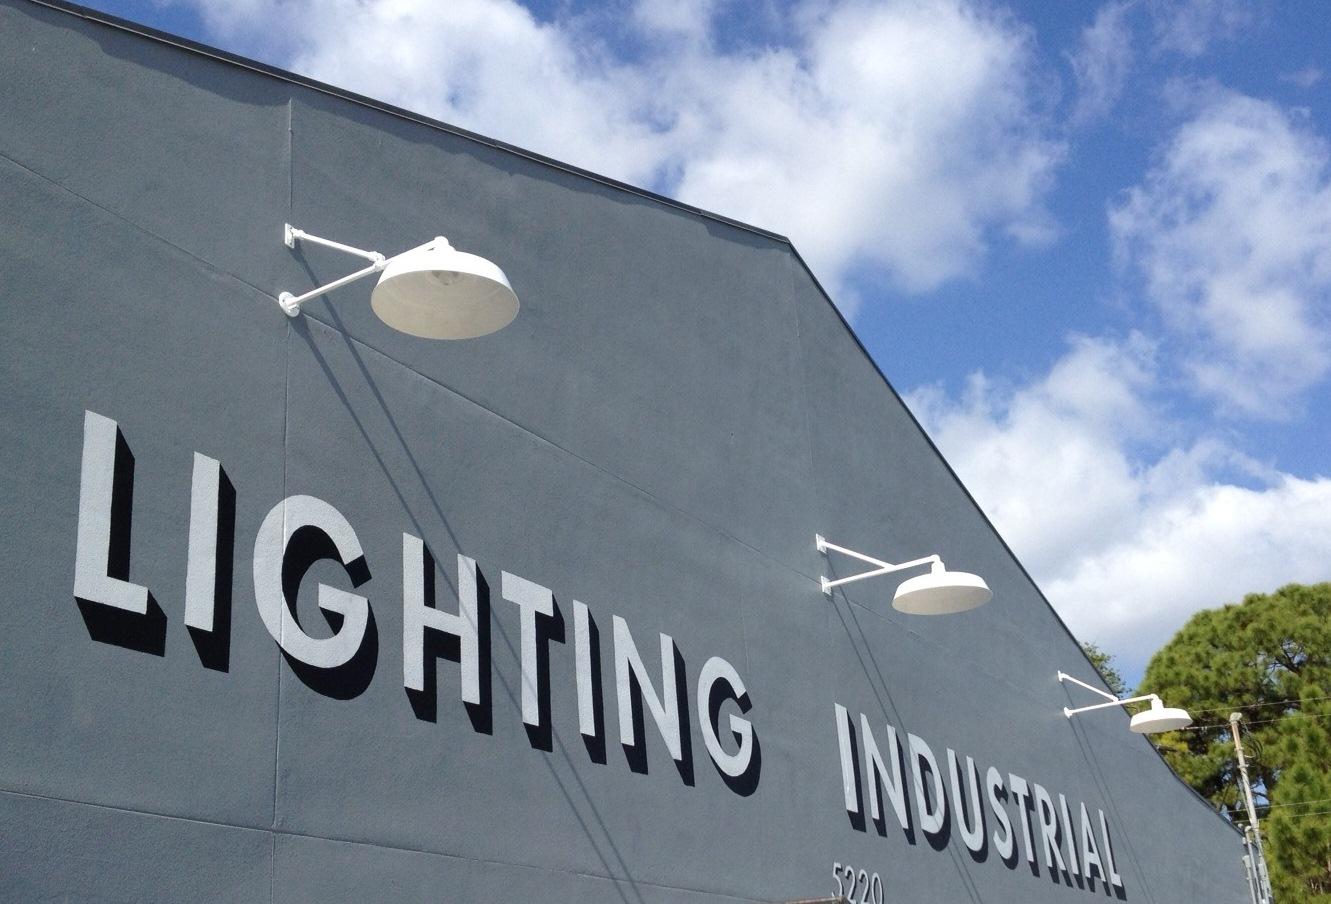 the original warehouse gooseneck light commercial